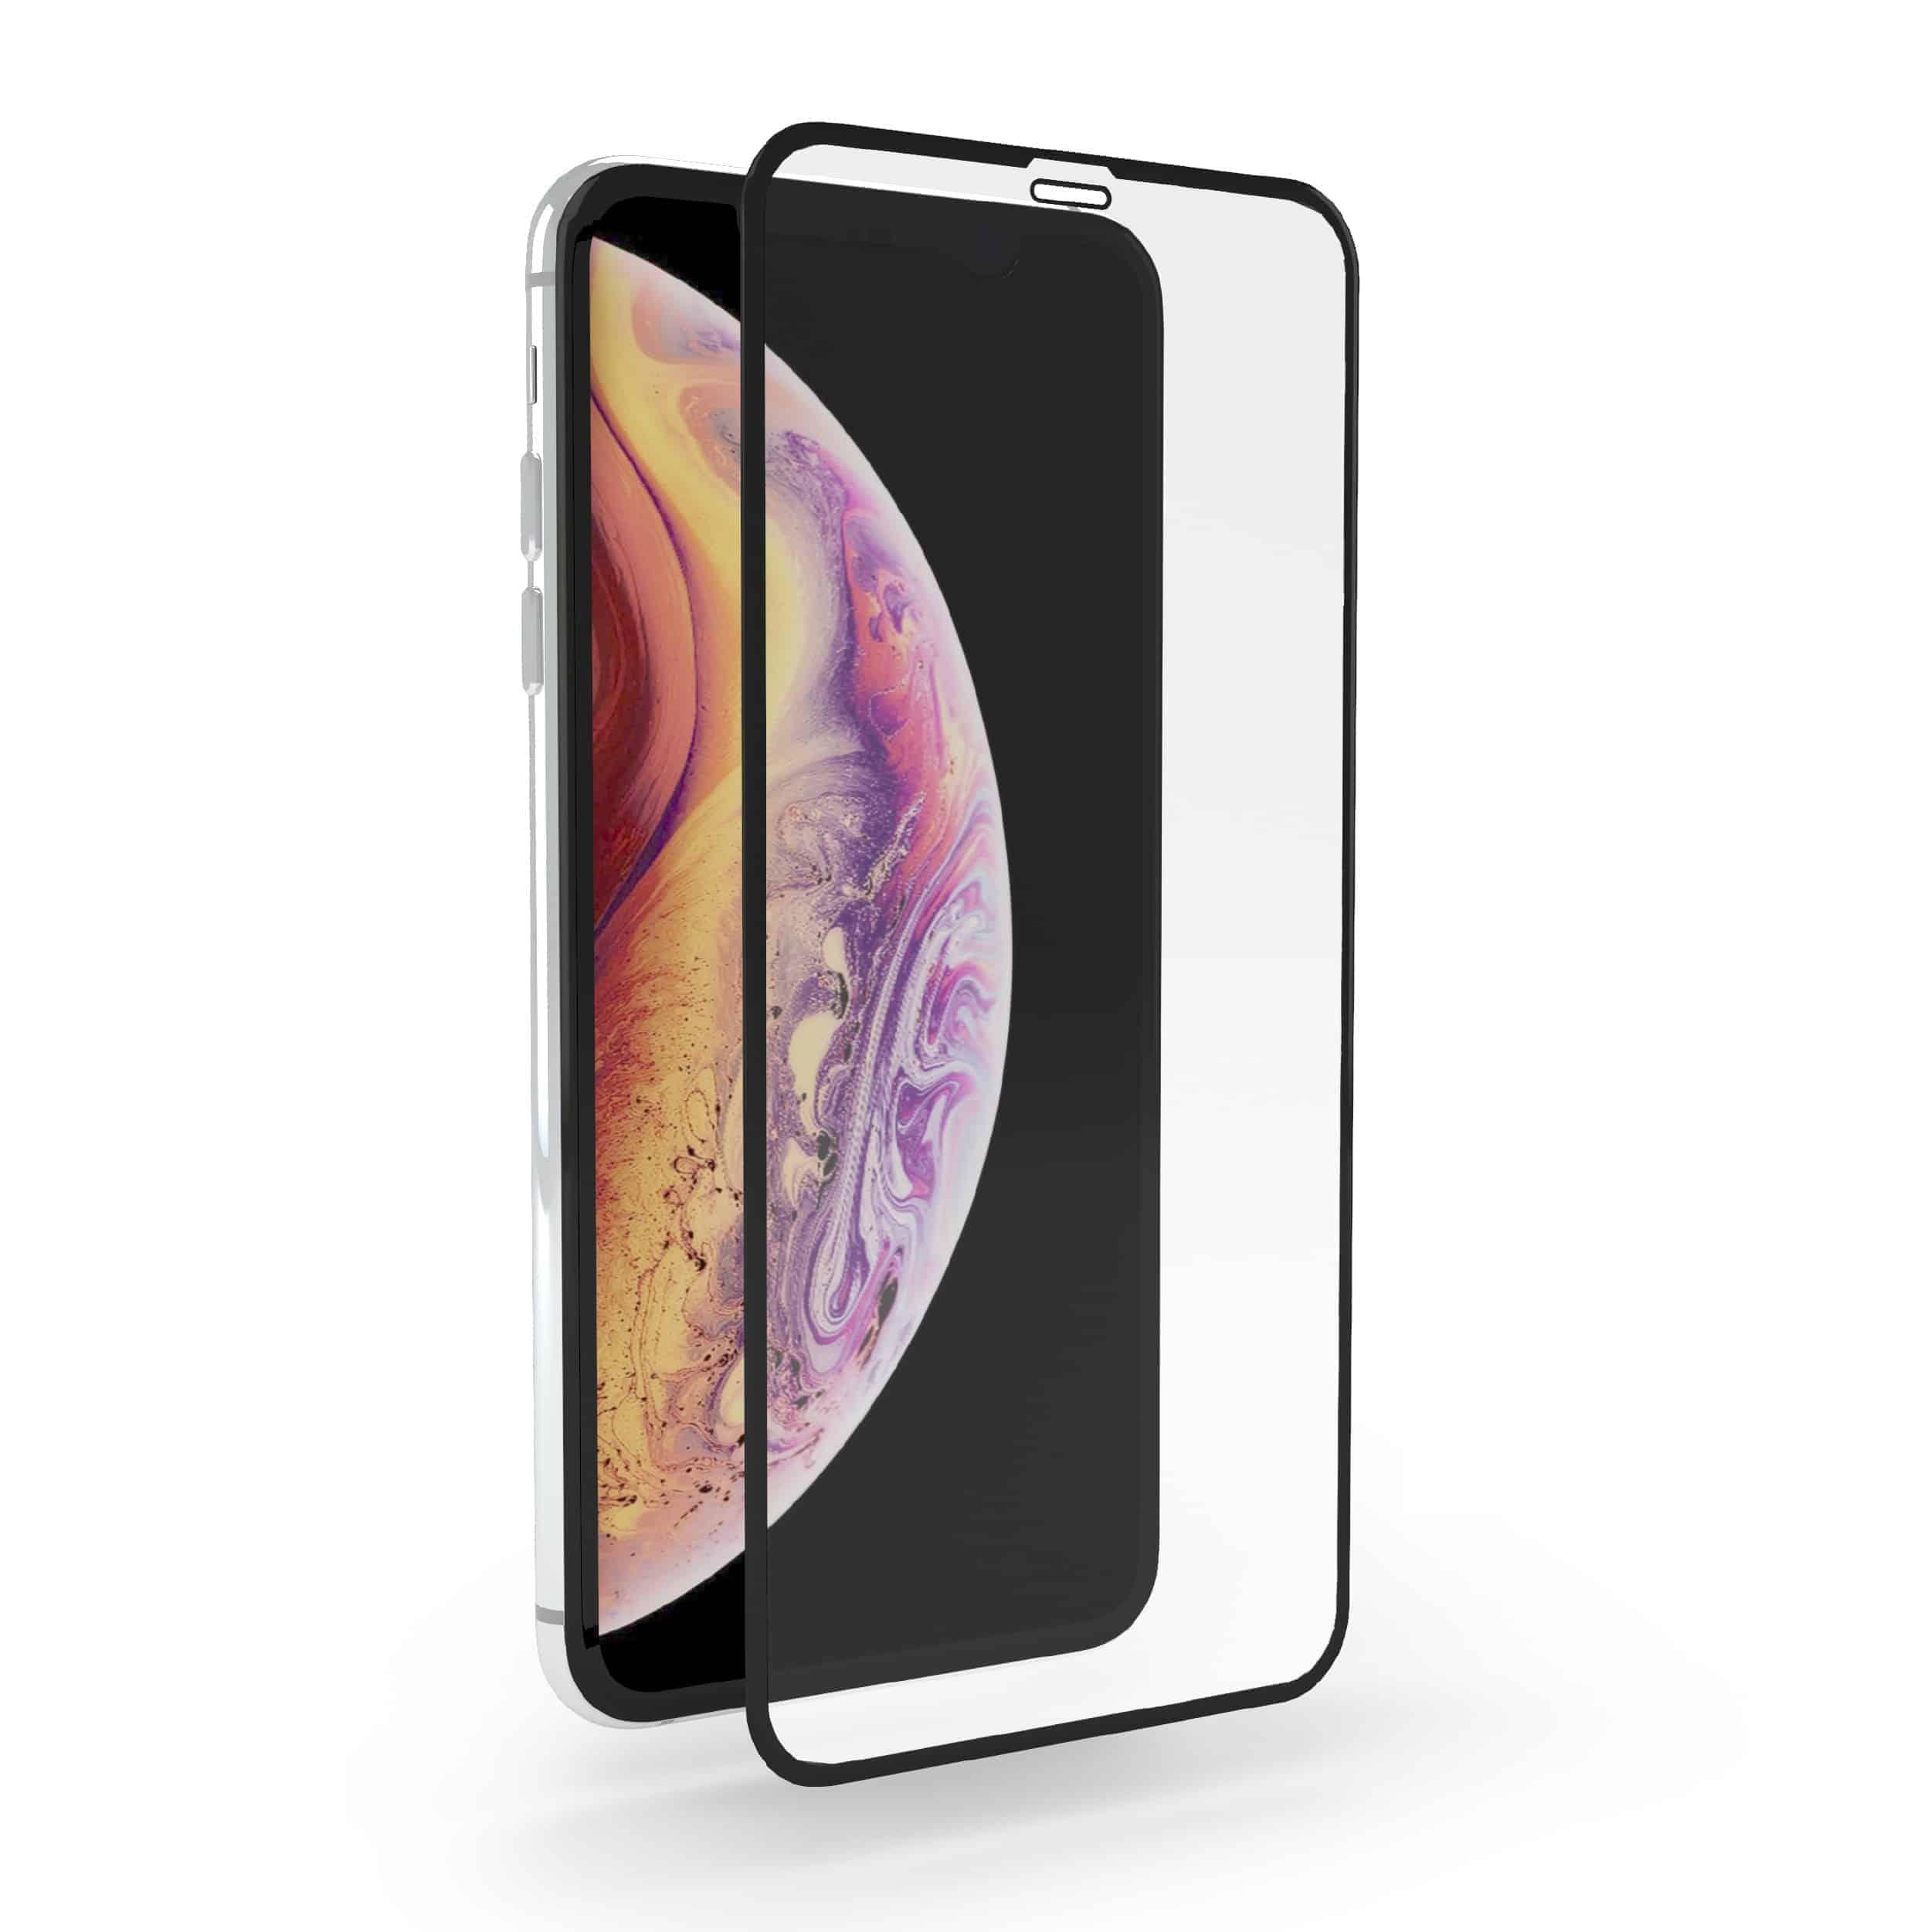 【ThanoTech】 E2E 3D 頂級玻璃螢幕保護貼 for iPhone Xs Max - NETY